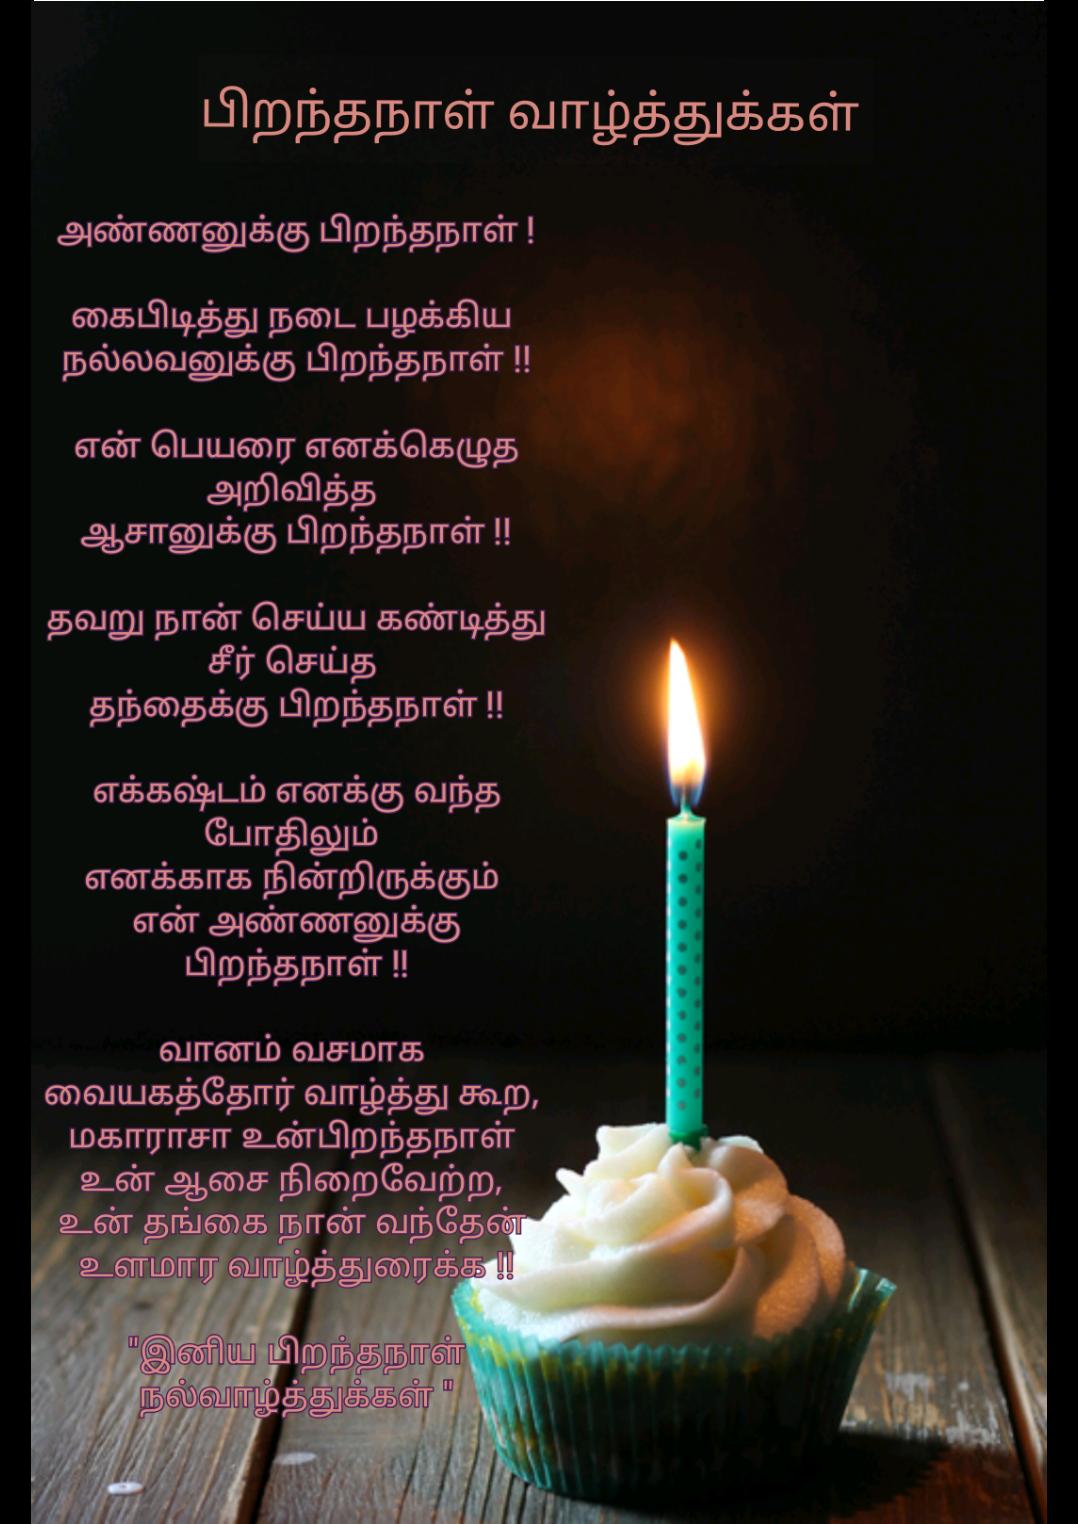 Brother Birthday Wishes Birthday Greeting Brother Birthday Greeting Birthday Wishes For Brother Birthday Wishes Birthday Wishes Greetings Love you sis and happy birthday. brother birthday wishes birthday